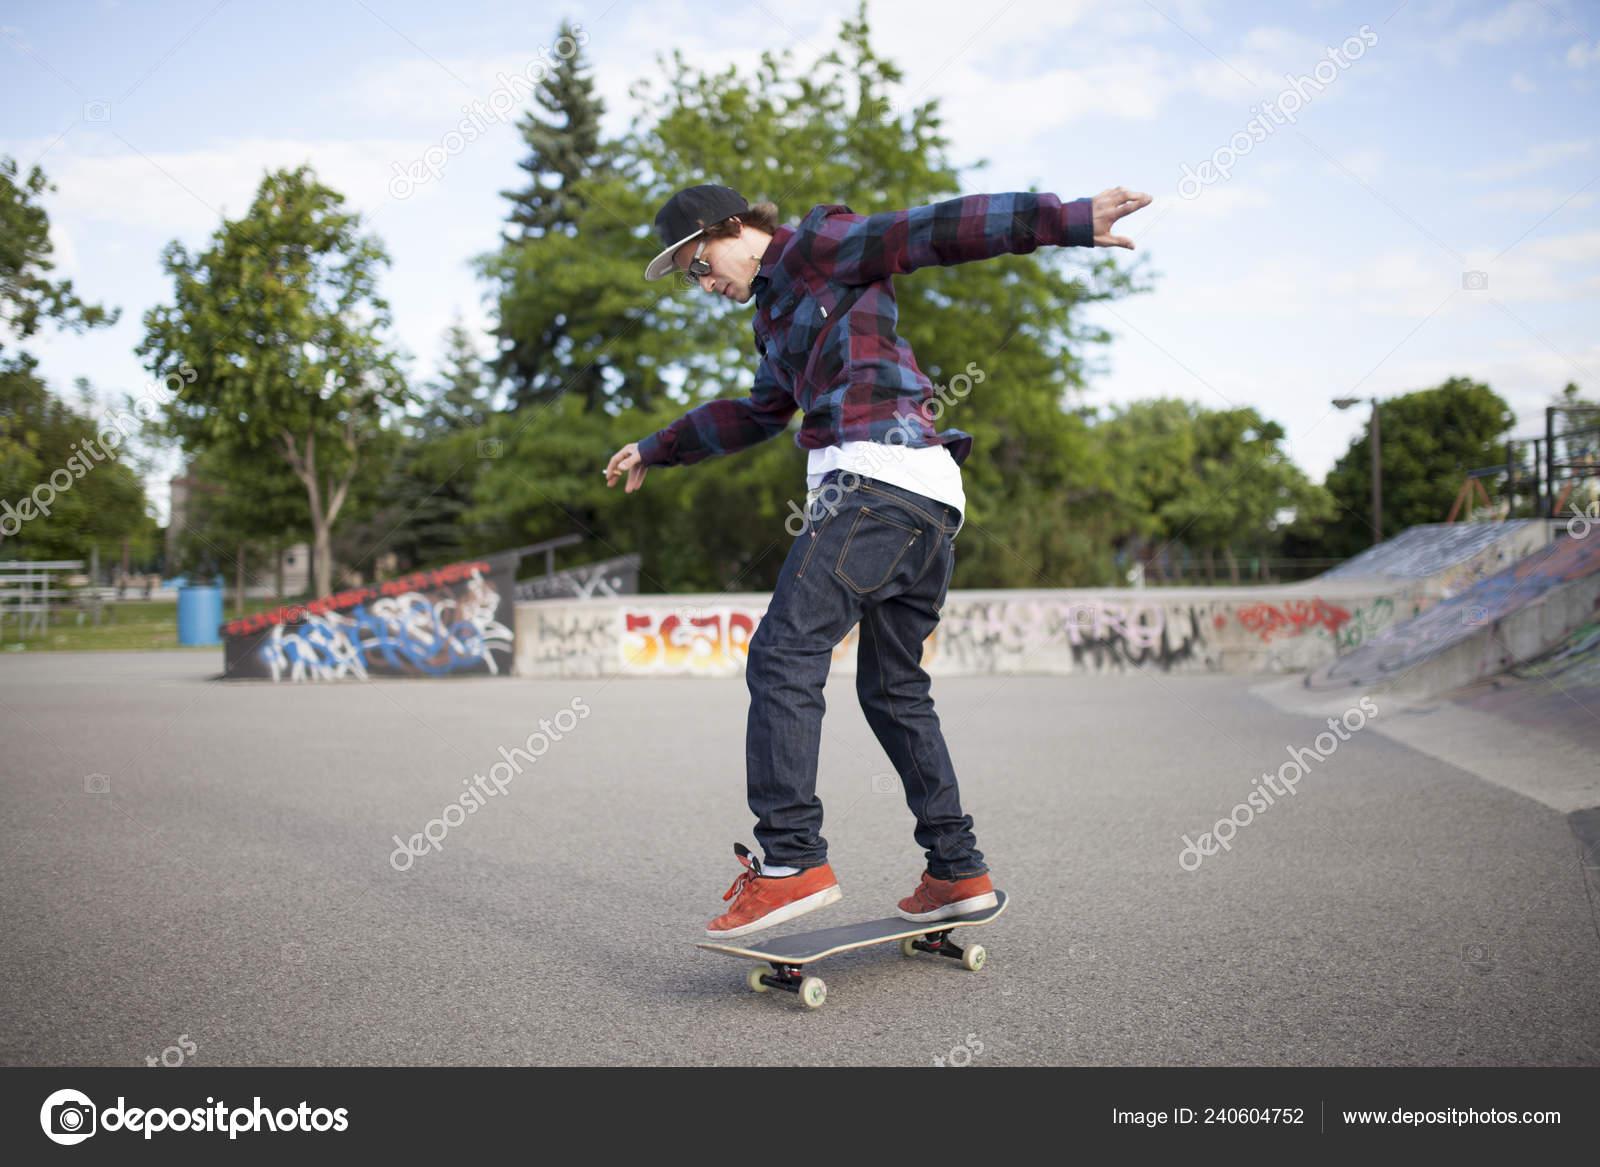 80d445db Skatista Skate Durante Dia Parque Skate — Stock Photo © atelierknox ...